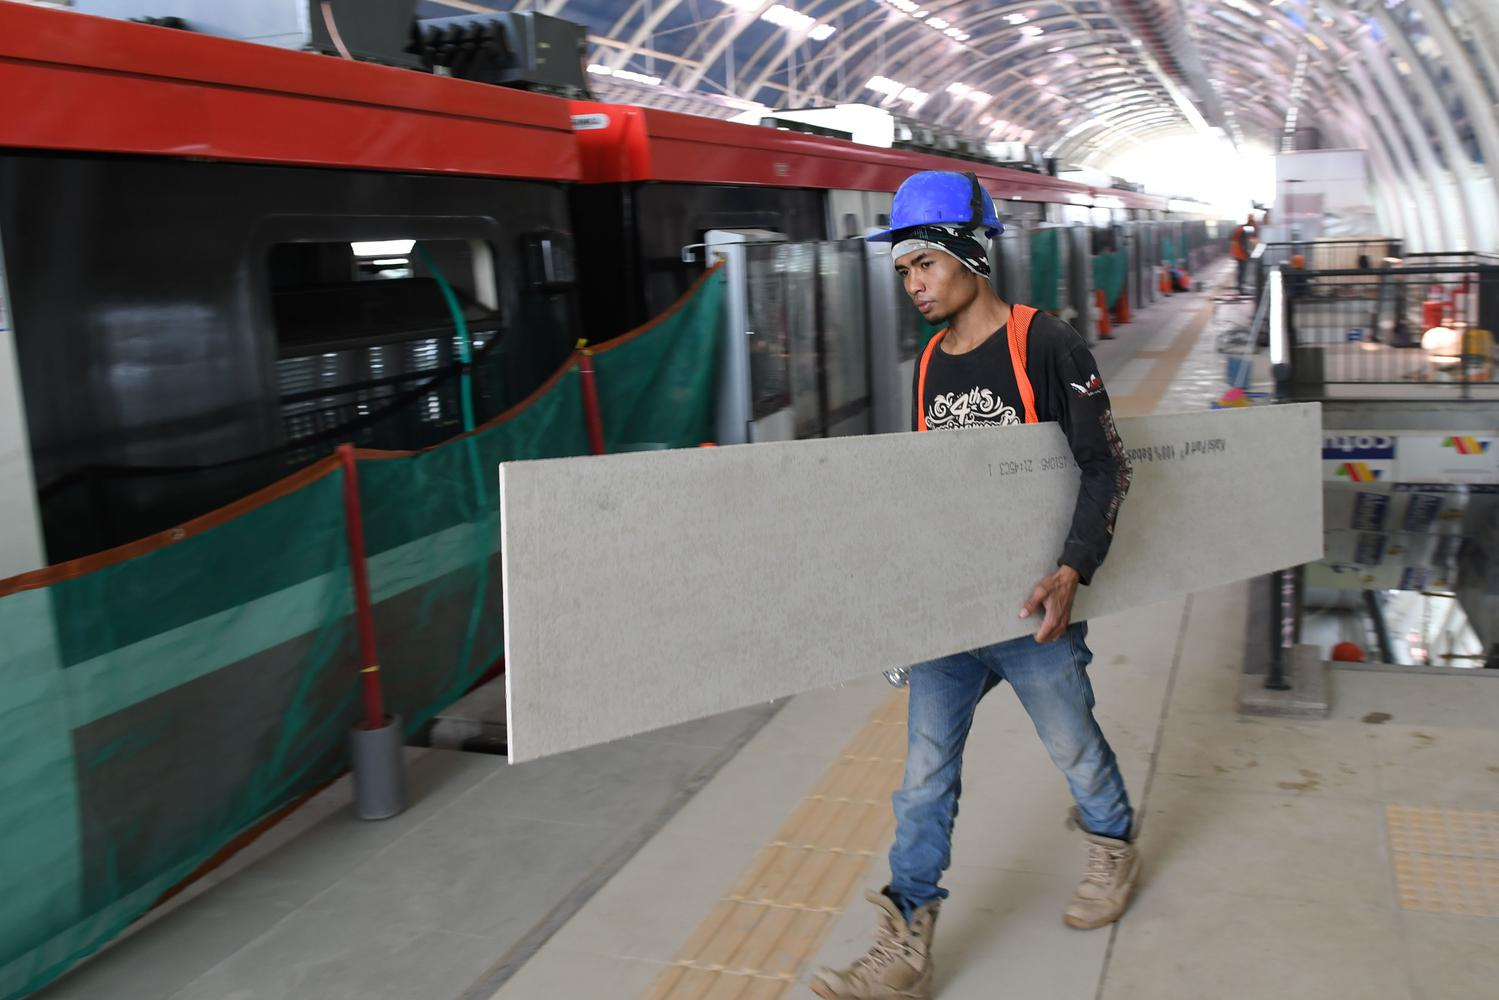 Pekerja melintasi gerbong kereta 'light rail train' atau lintas rel terpadu (LRT) di Stasiun Harjamukti, Cimanggis, Kota Depok, Jawa Barat, Rabu (4/12/2019).